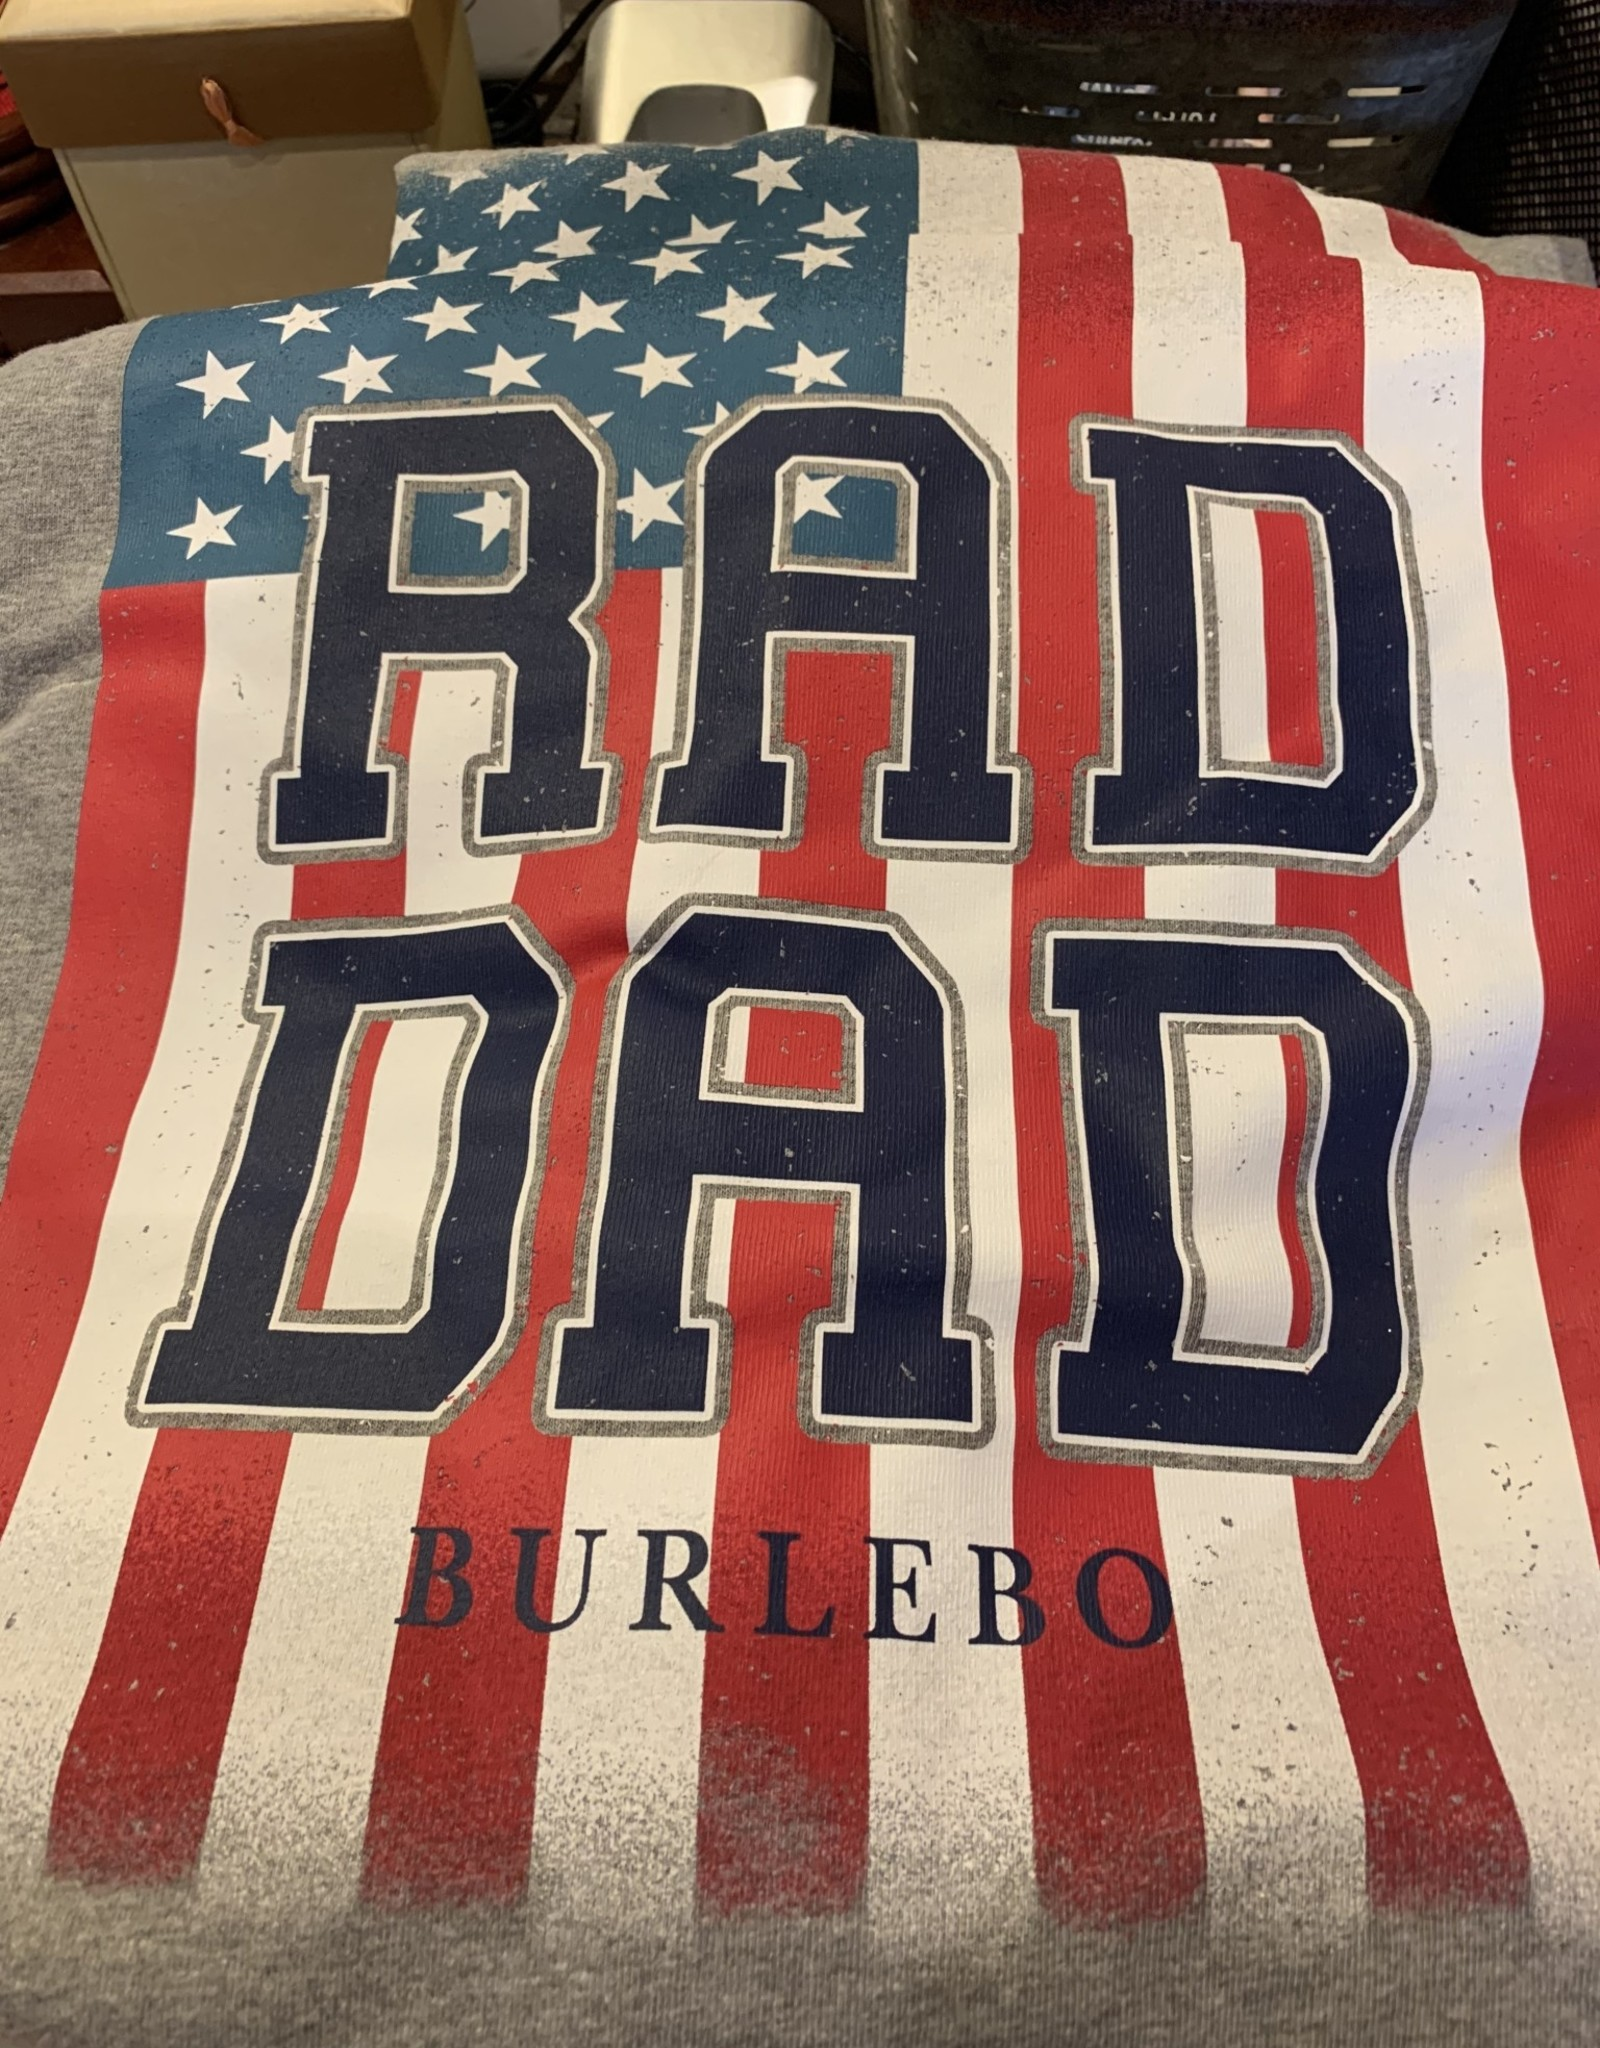 Burlebo Burlebo- S/S Dark Heather Grey Rad Dad